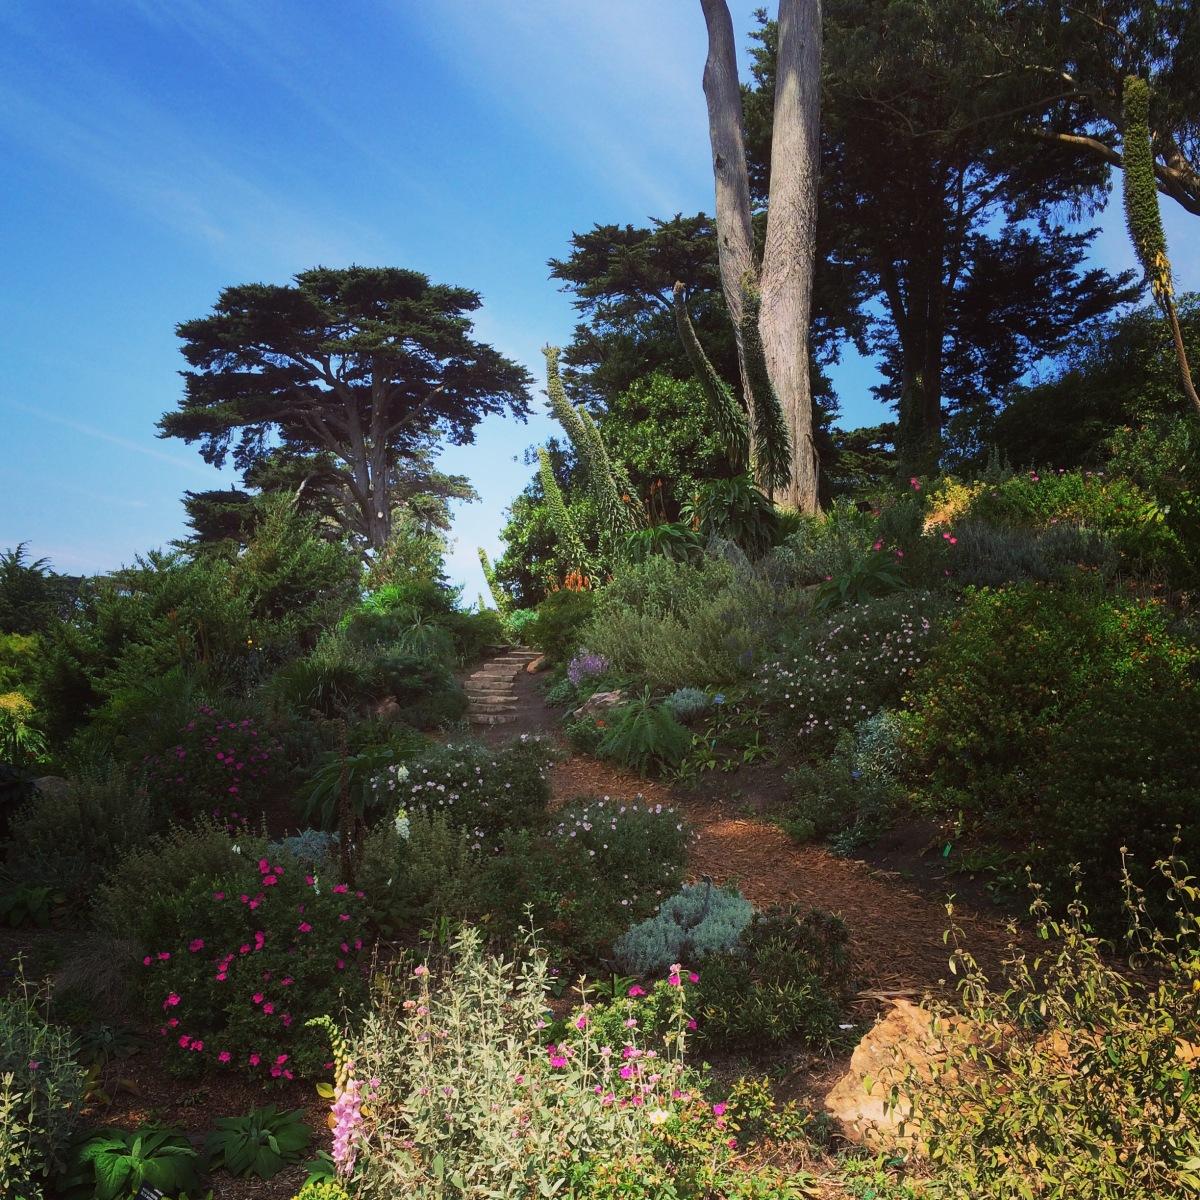 Botanic Gardens Golden Gate Park San Francisco Bulldog Travels